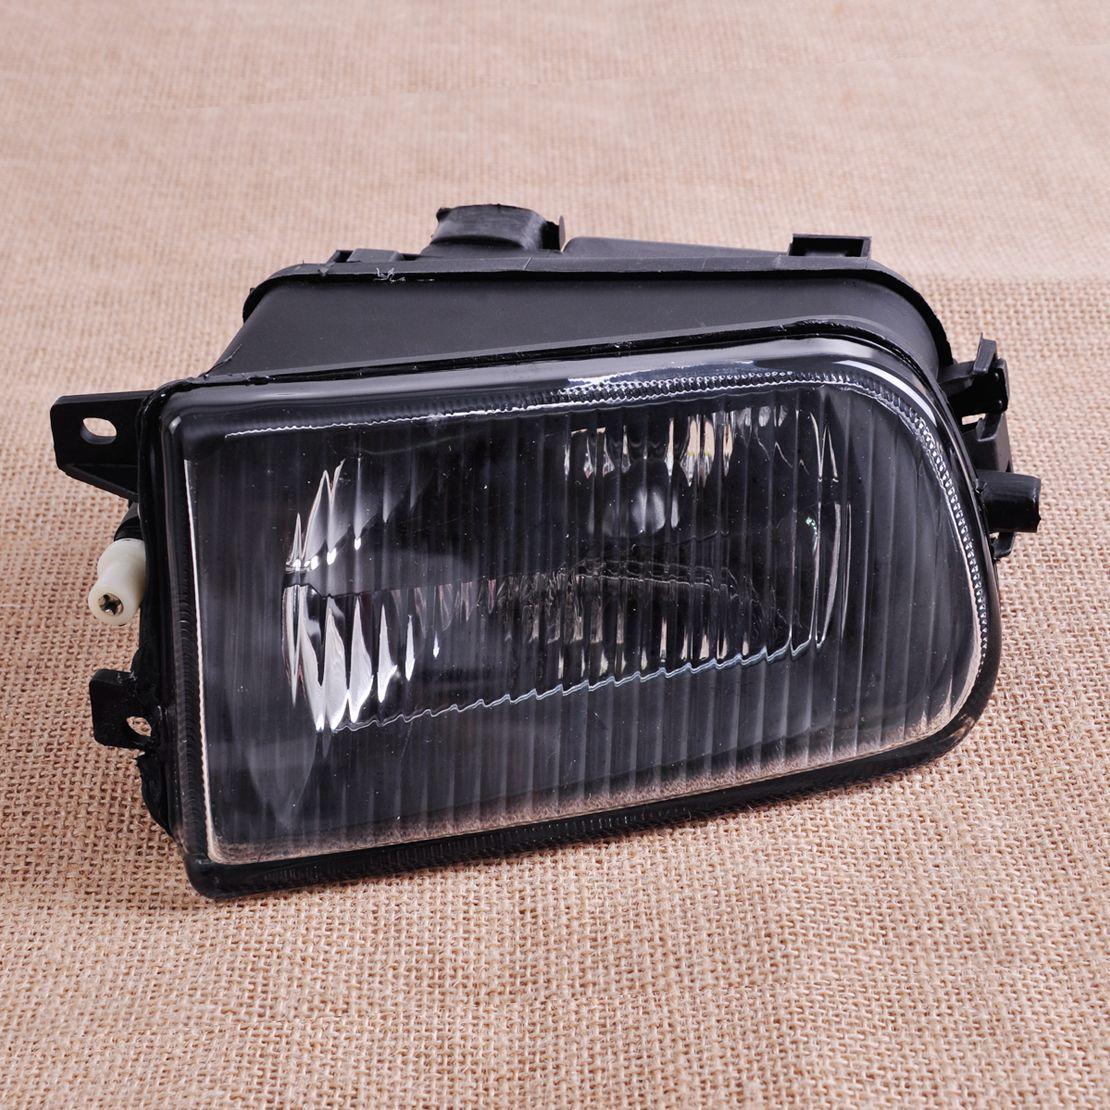 $23.69 (Buy here: https://alitems.com/g/1e8d114494ebda23ff8b16525dc3e8/?i=5&ulp=https%3A%2F%2Fwww.aliexpress.com%2Fitem%2F63178360576-63178381978-Right-Side-Fog-Light-Lamp-Fit-for-BMW-E36-Z3-E39-5-Series-528i%2F32698399182.html ) 63178360576 63178381978 Right Side Fog Light Lamp Fit for BMW E36 Z3 E39 5 Series 528i 540i 535i 1997 1998 1999 2000 for just $23.69